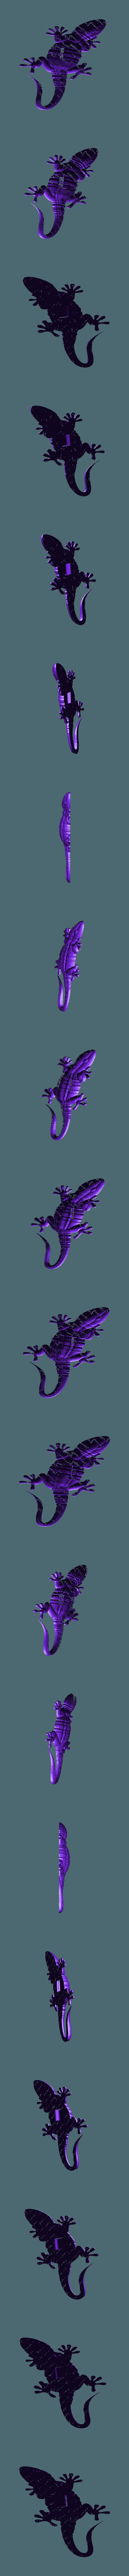 GeckoMirrored.stl Download free STL file Gecko • Design to 3D print, 3DWP